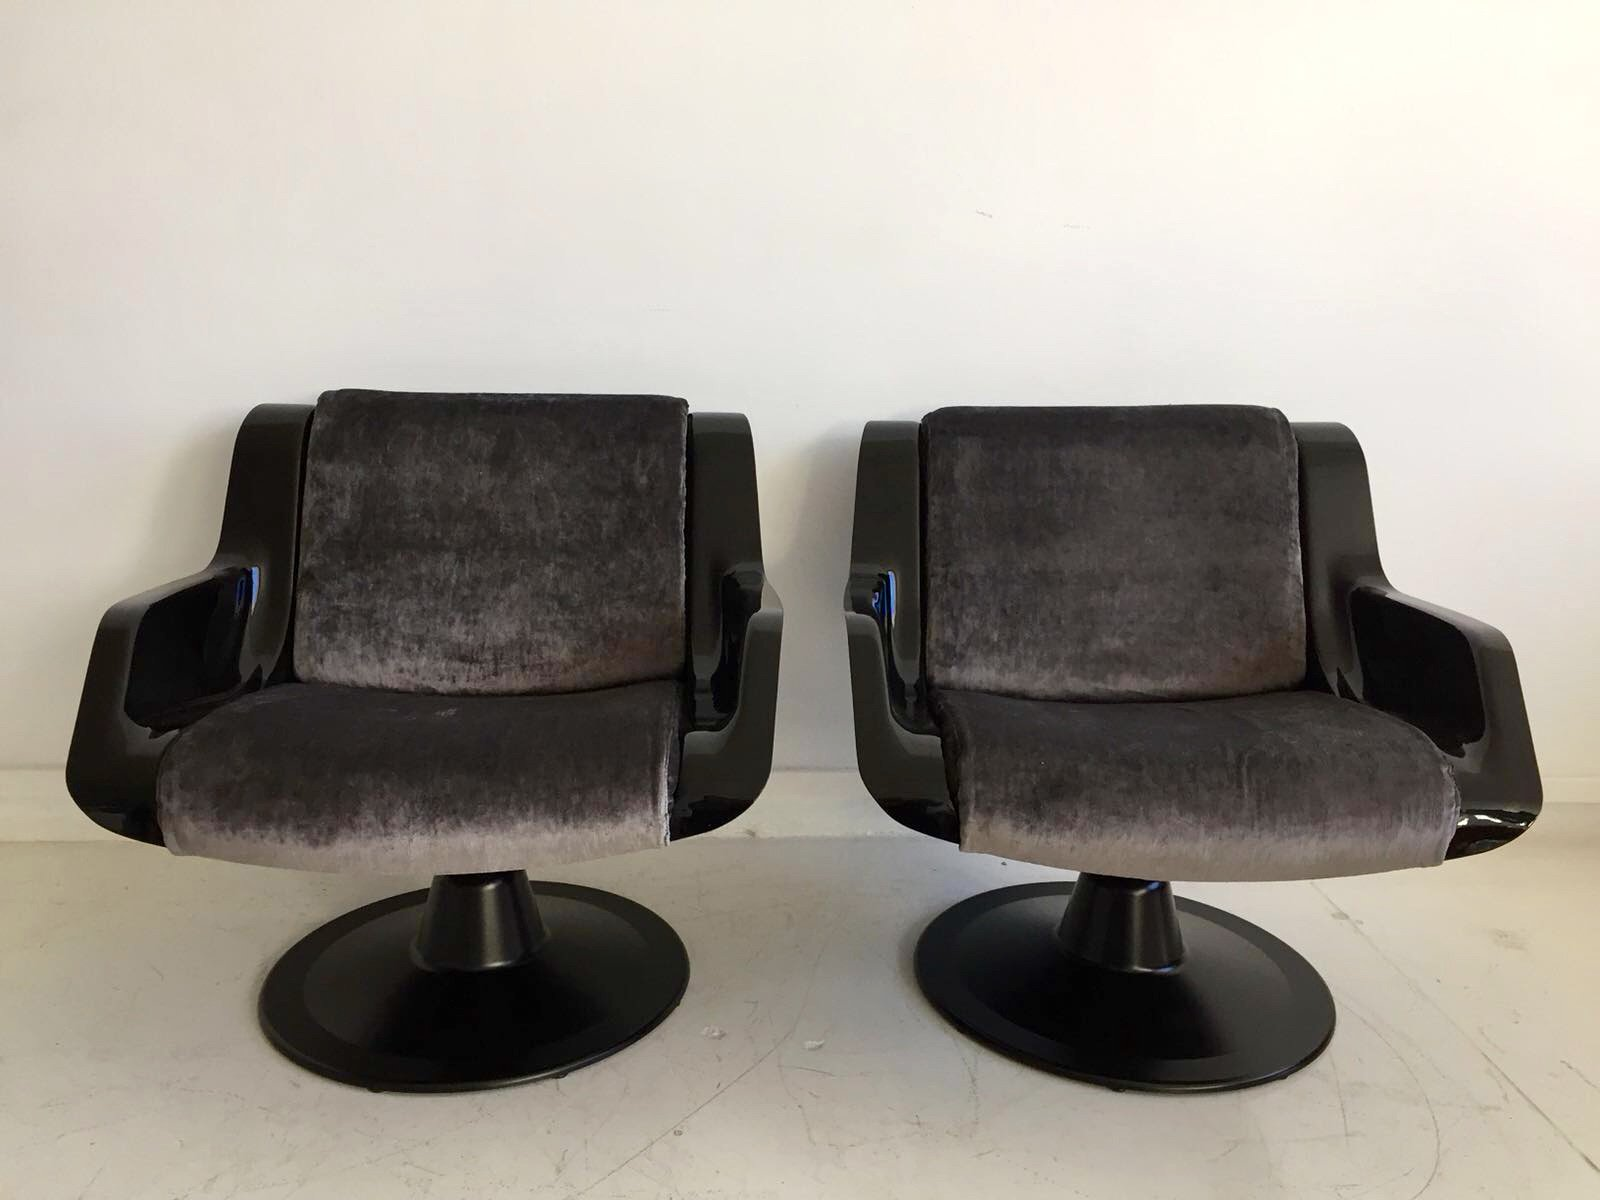 chairs furniture seating vladimir at for id club swivel sale chair z kagan nautilus f